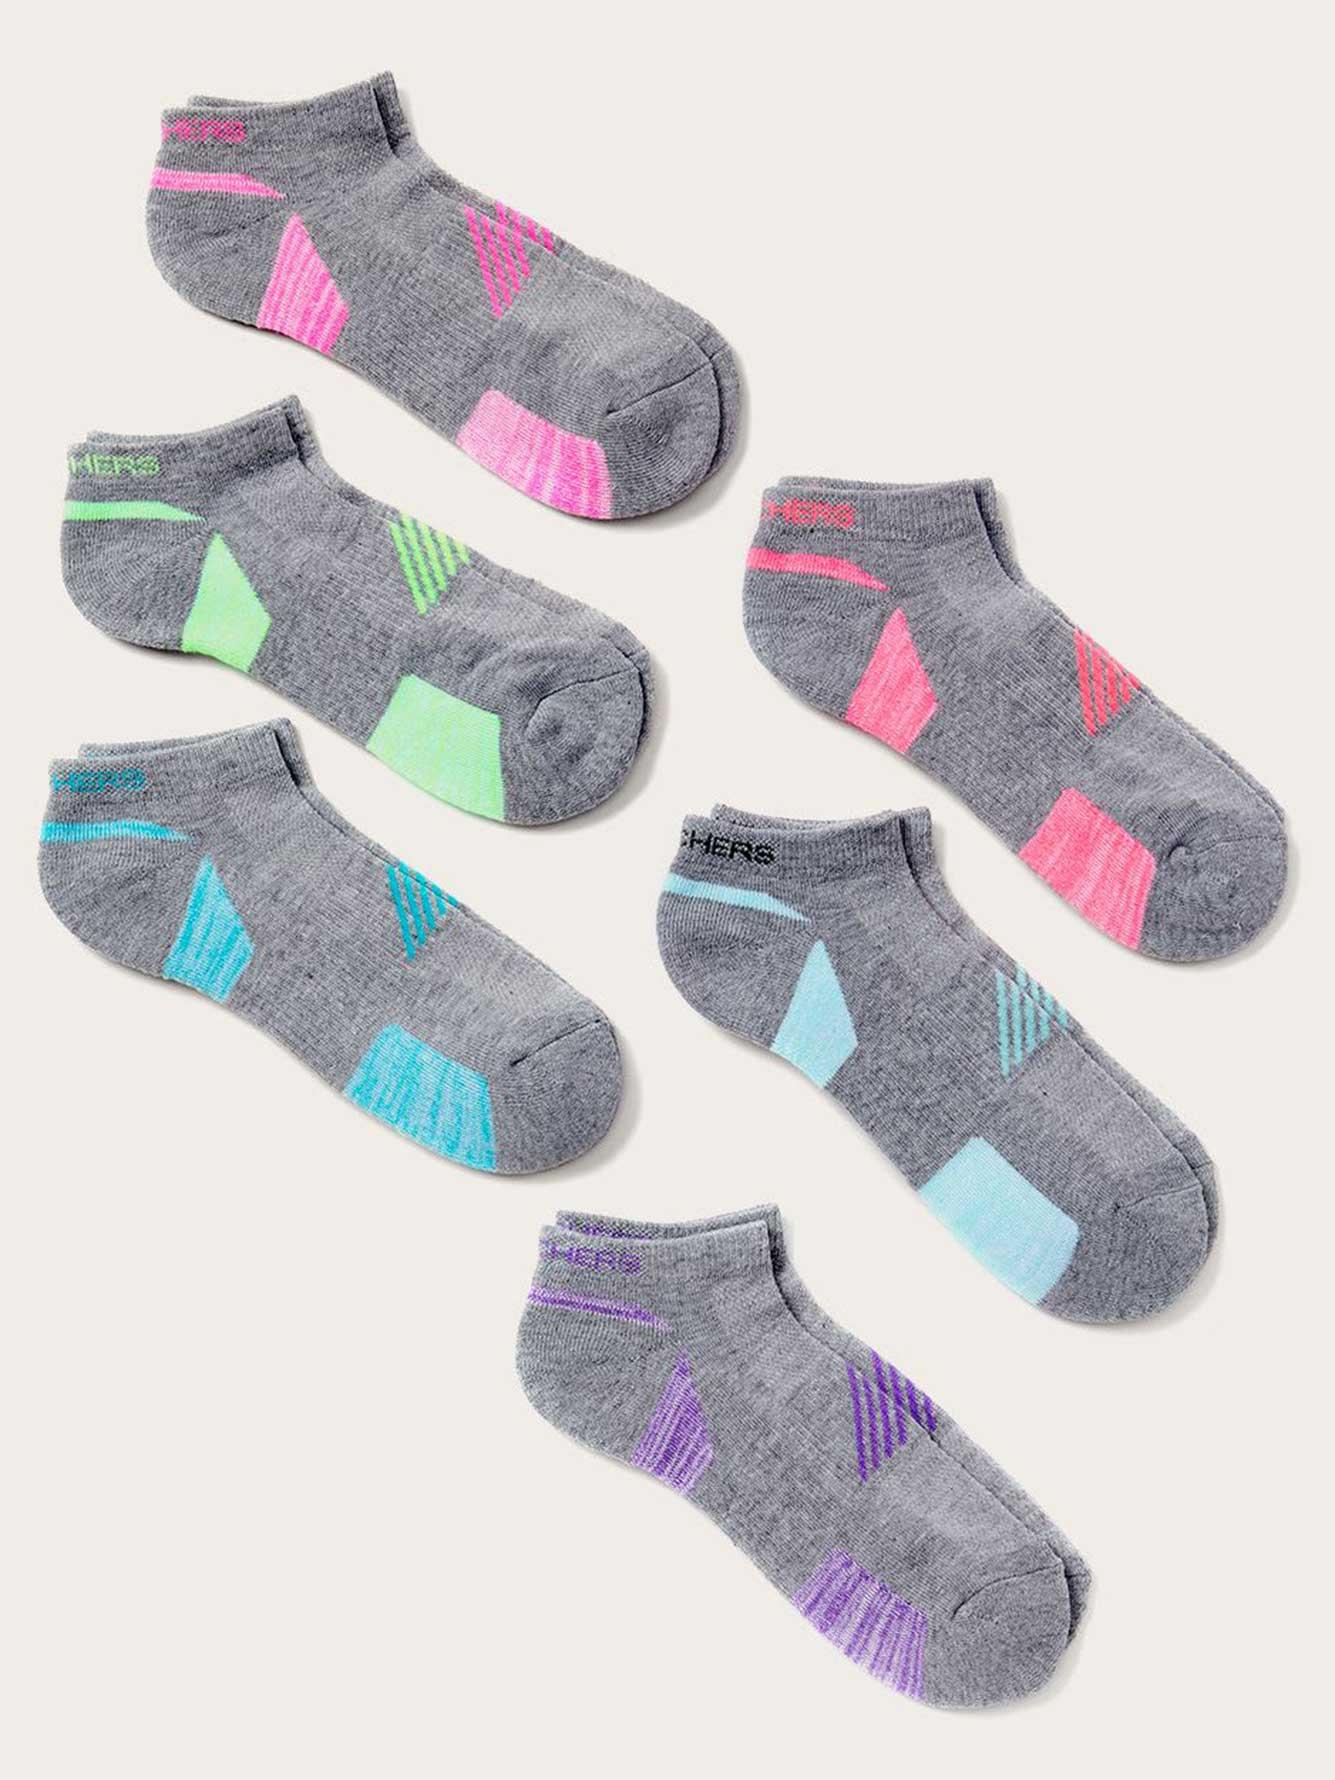 skechers socks online